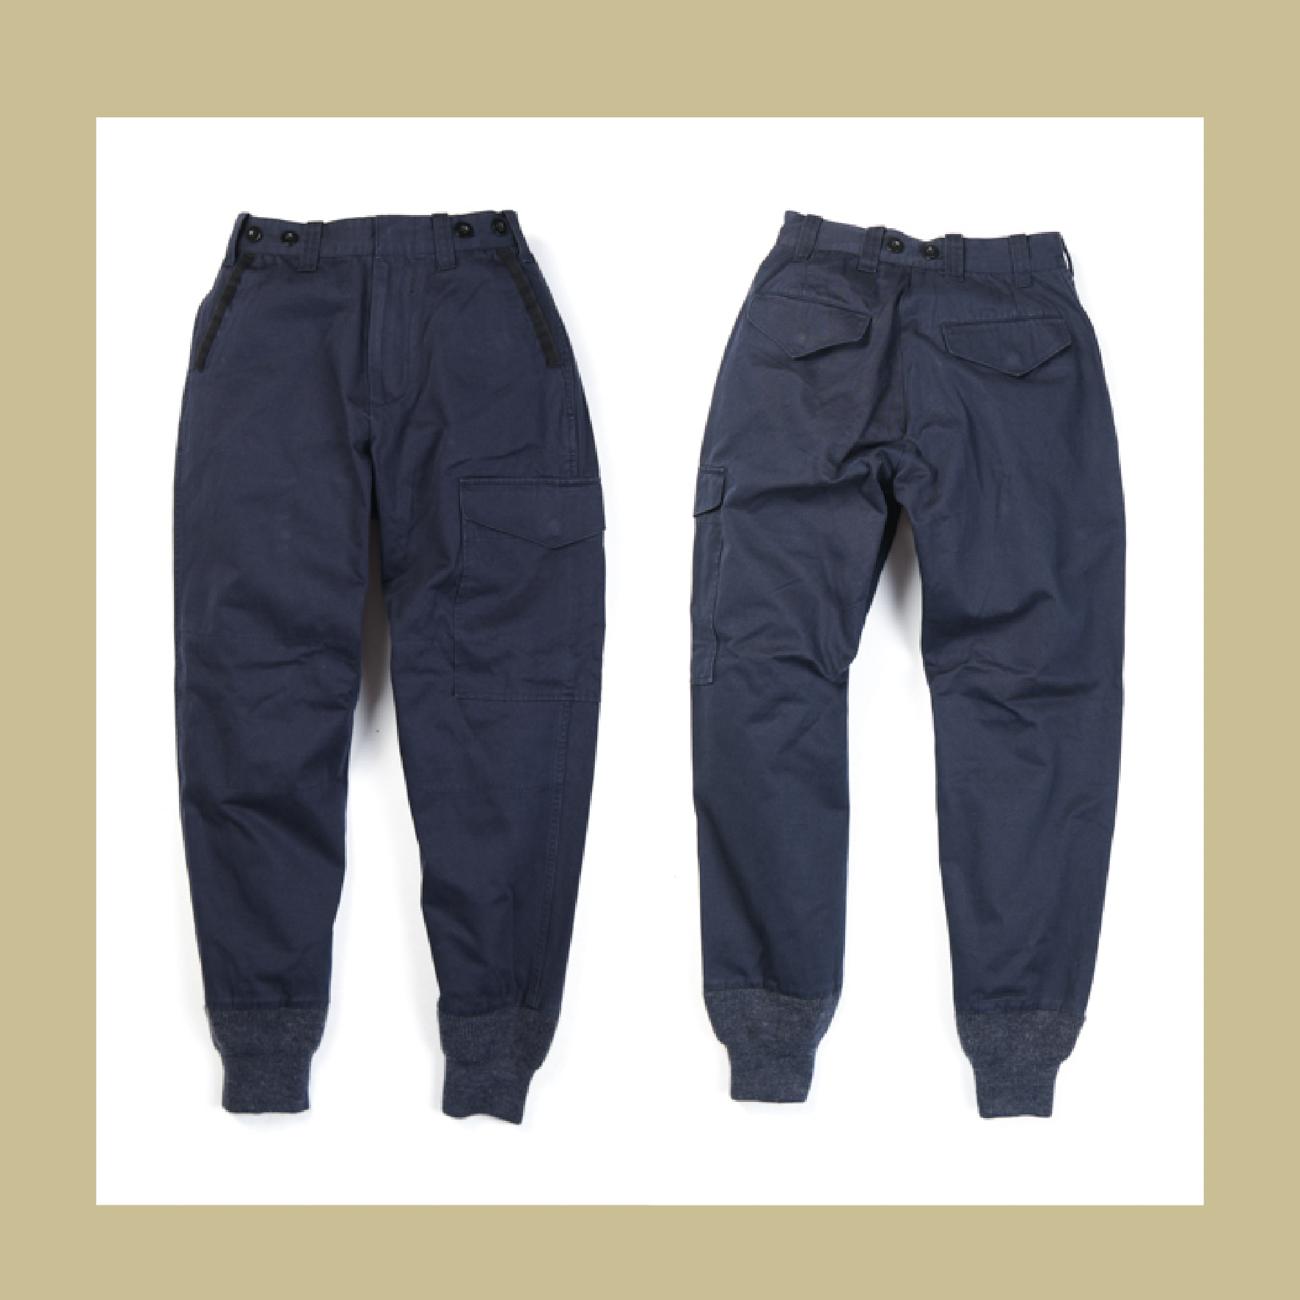 UNIONBLUE BRITISH ARMY T-PANTS英军多口袋梭织螺纹体育训练裤